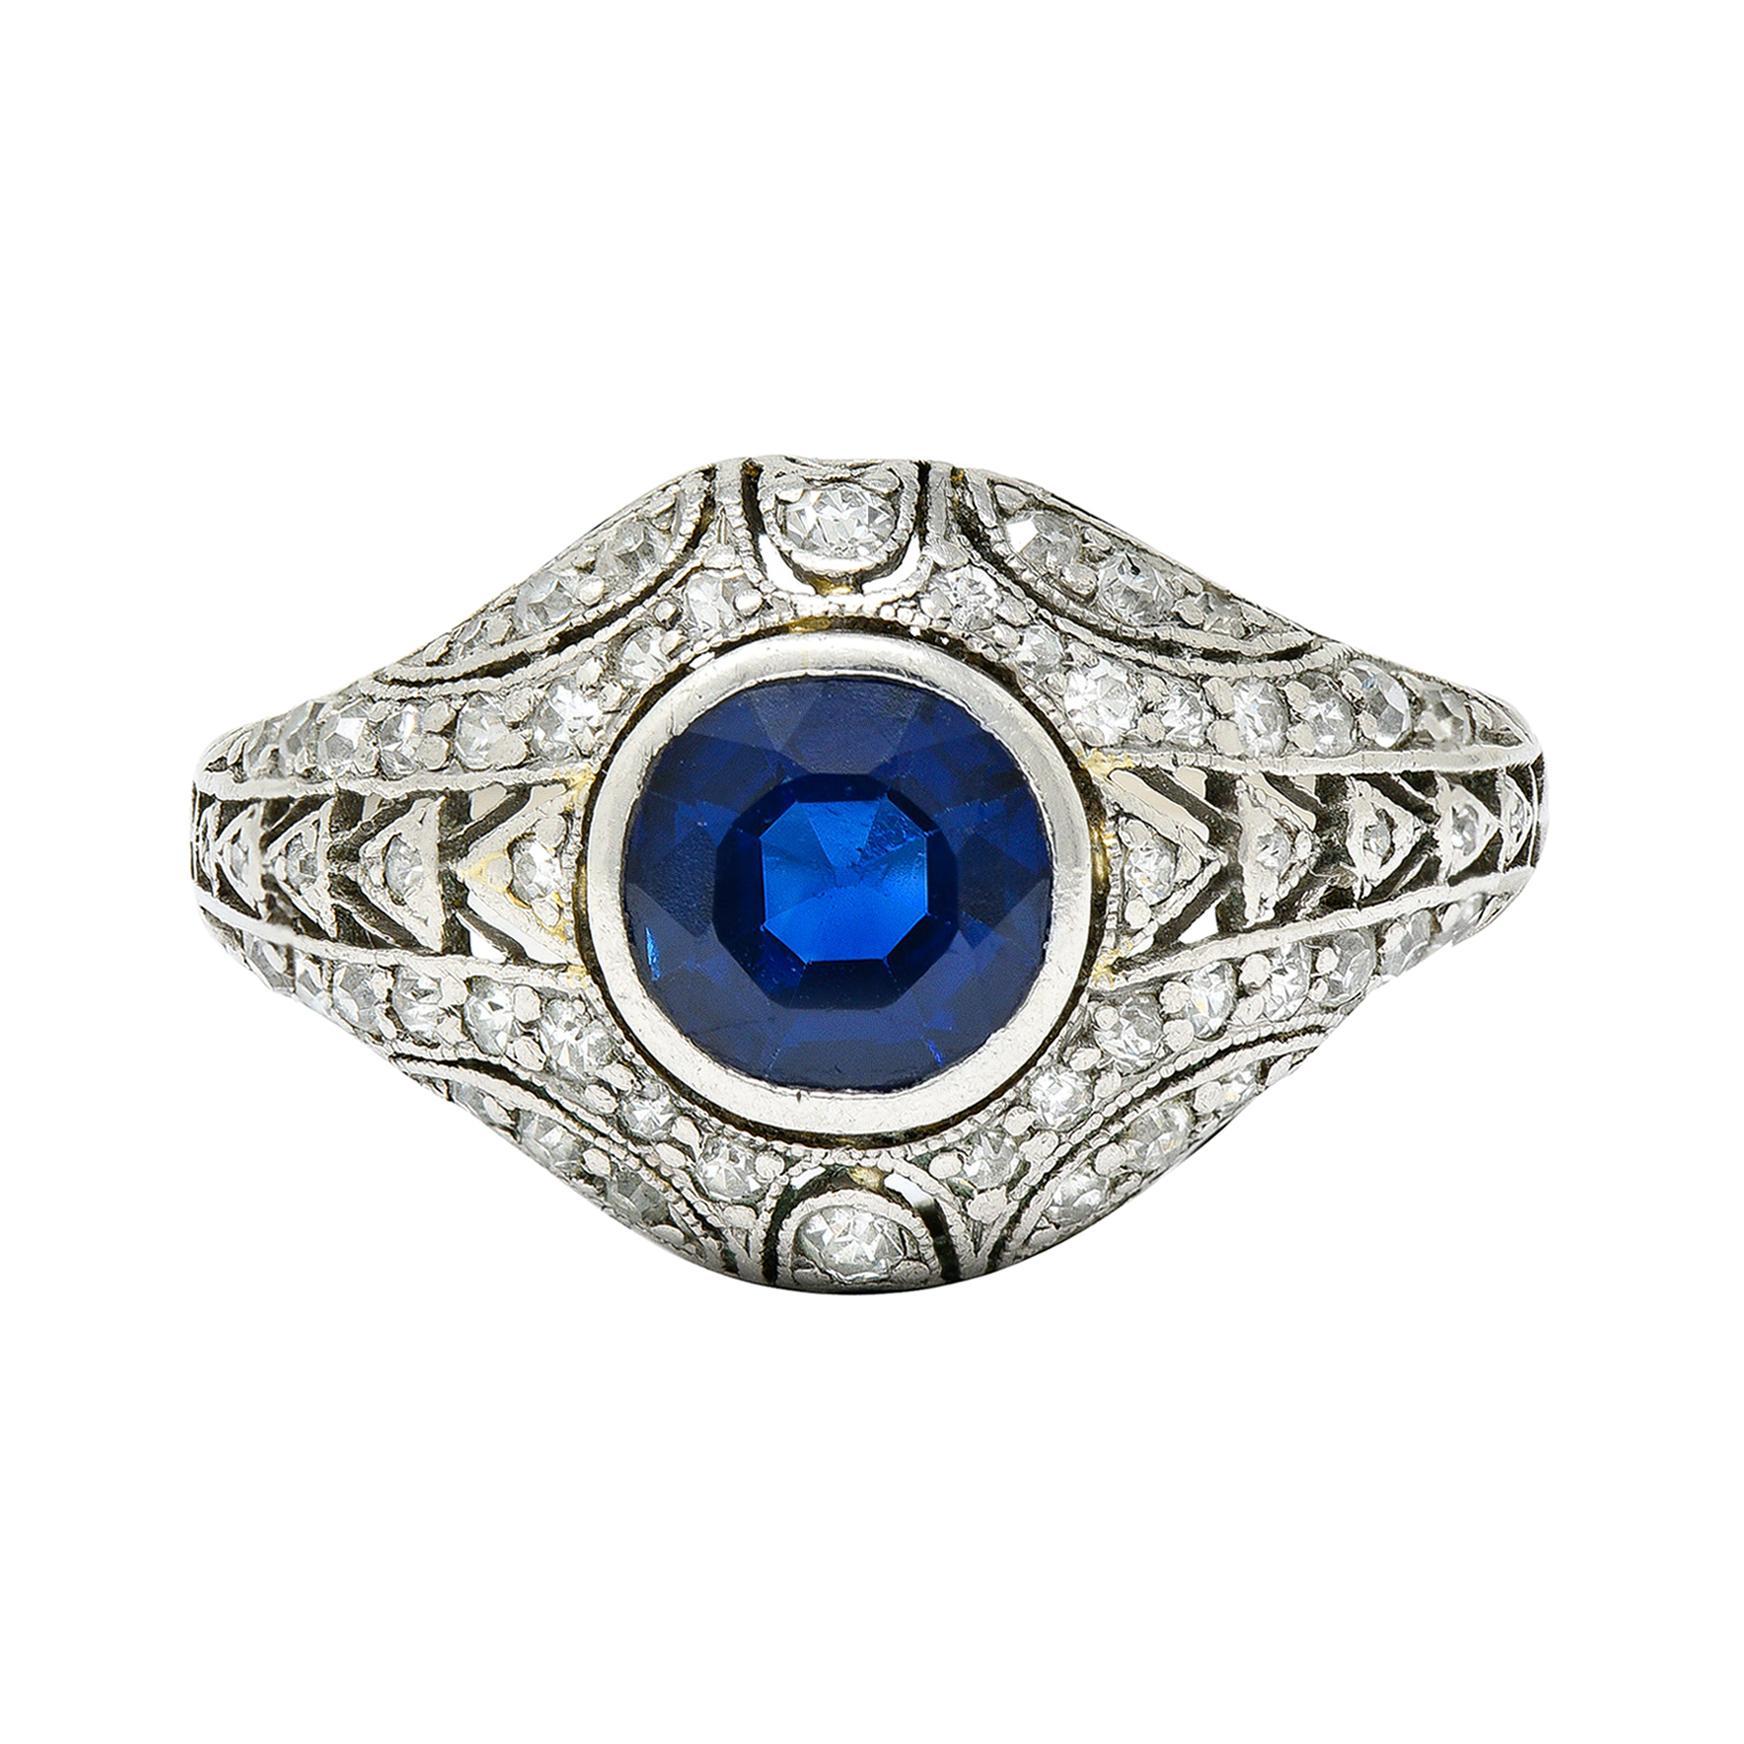 1920's Art Deco Sapphire Diamond Platinum Bombe Band Ring